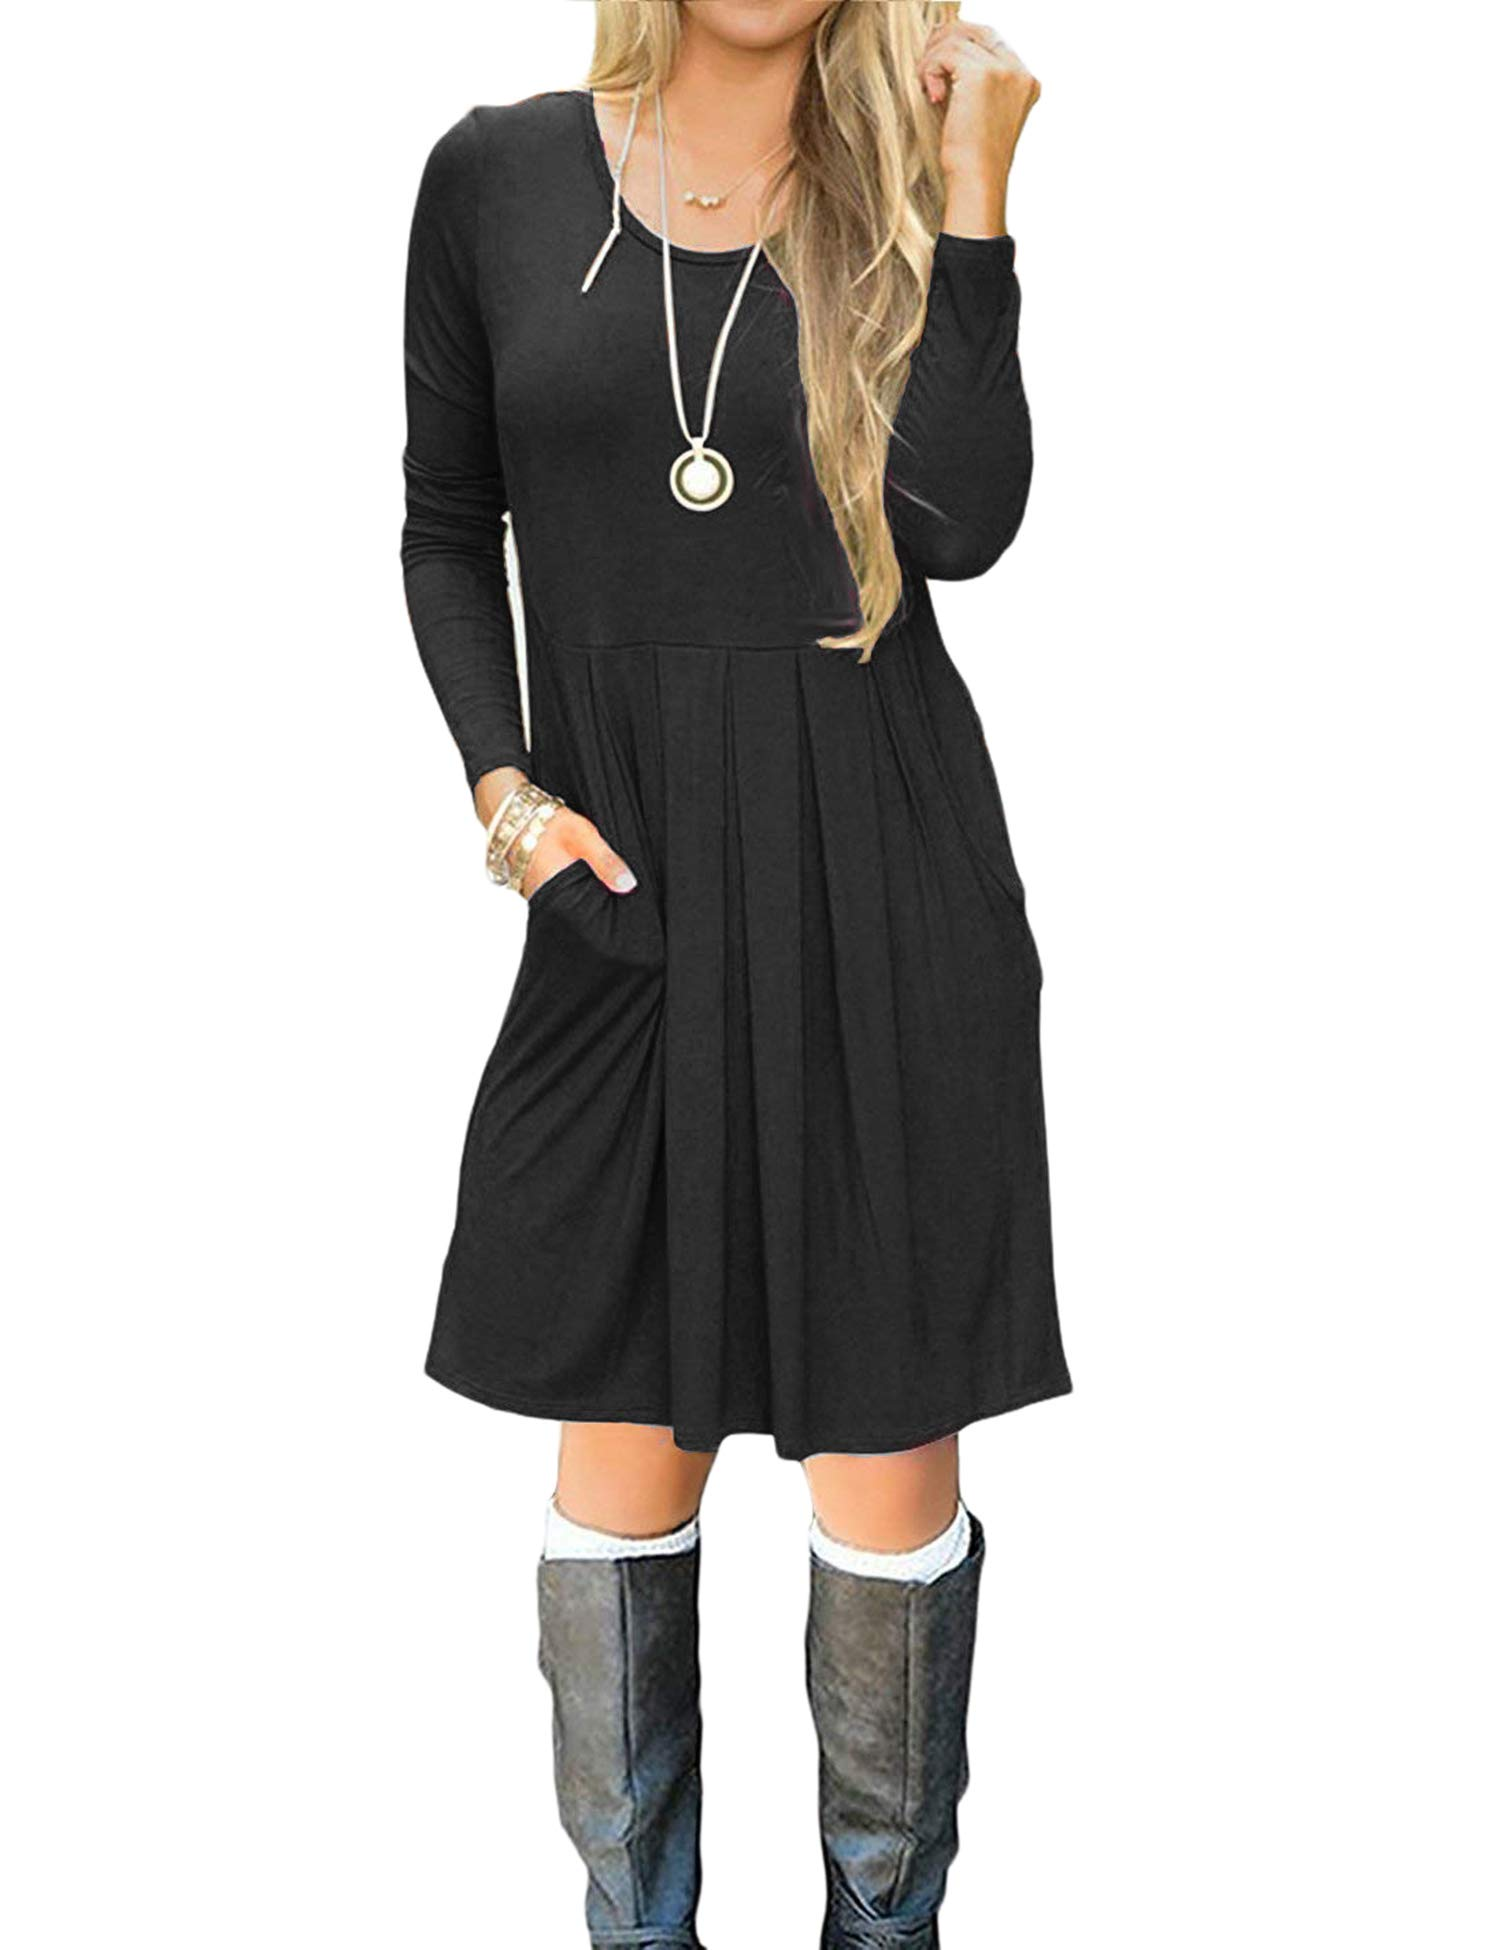 Uniboutique Women's Summer Long Sleeve Round Neck Casual Pleated Cotton Beach Dress Black M